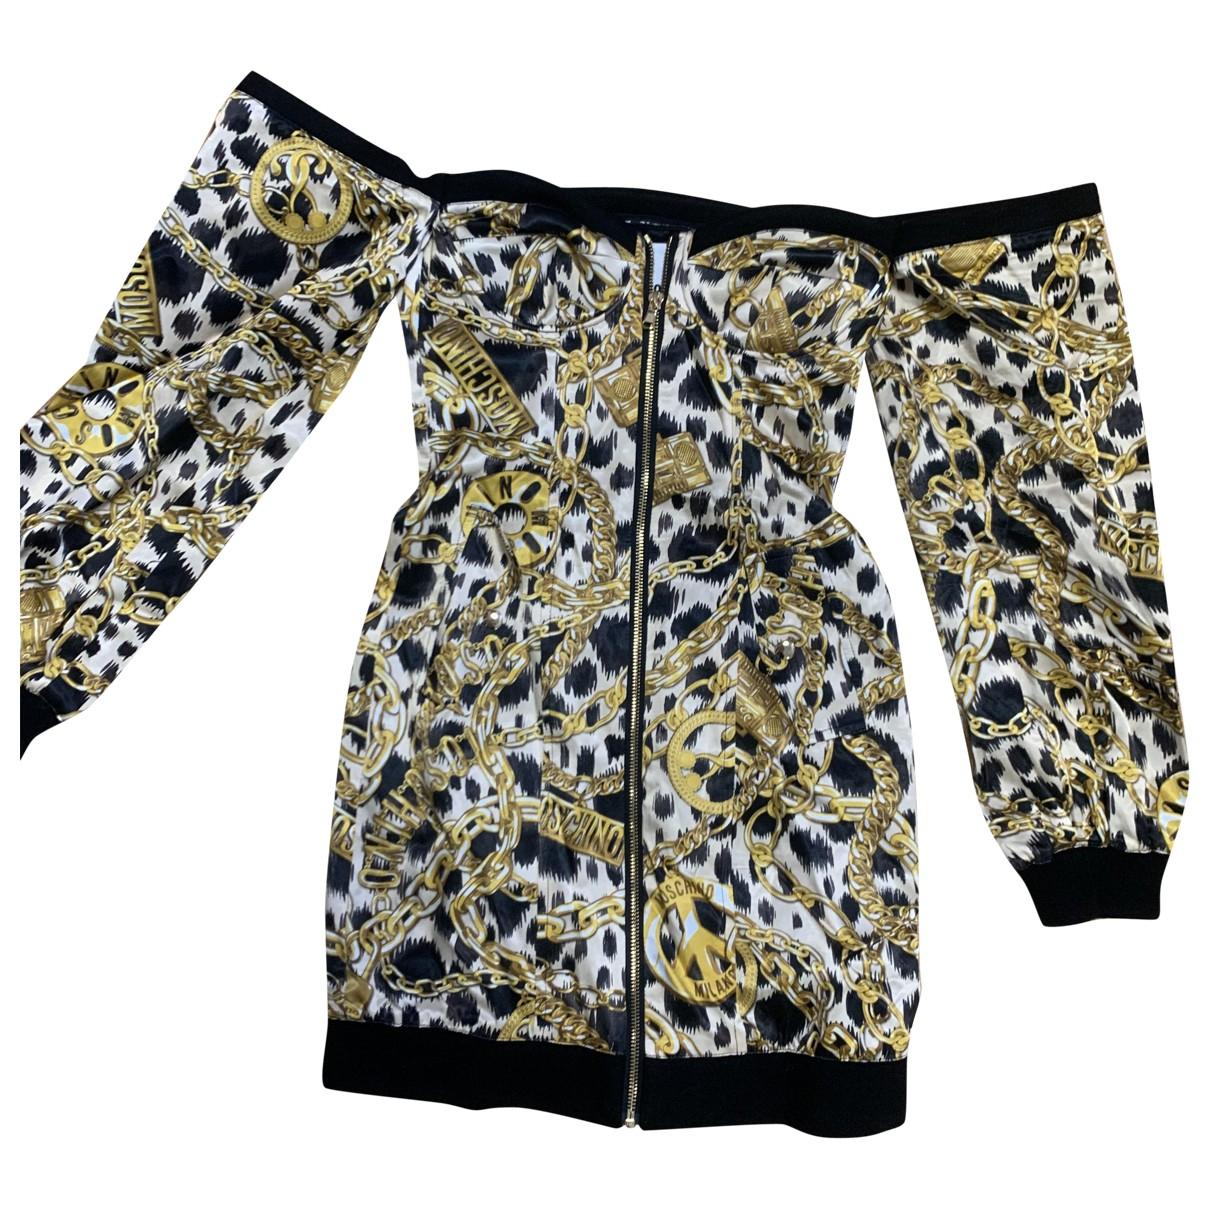 Moschino For H&m \N Kleid in  Schwarz Polyester